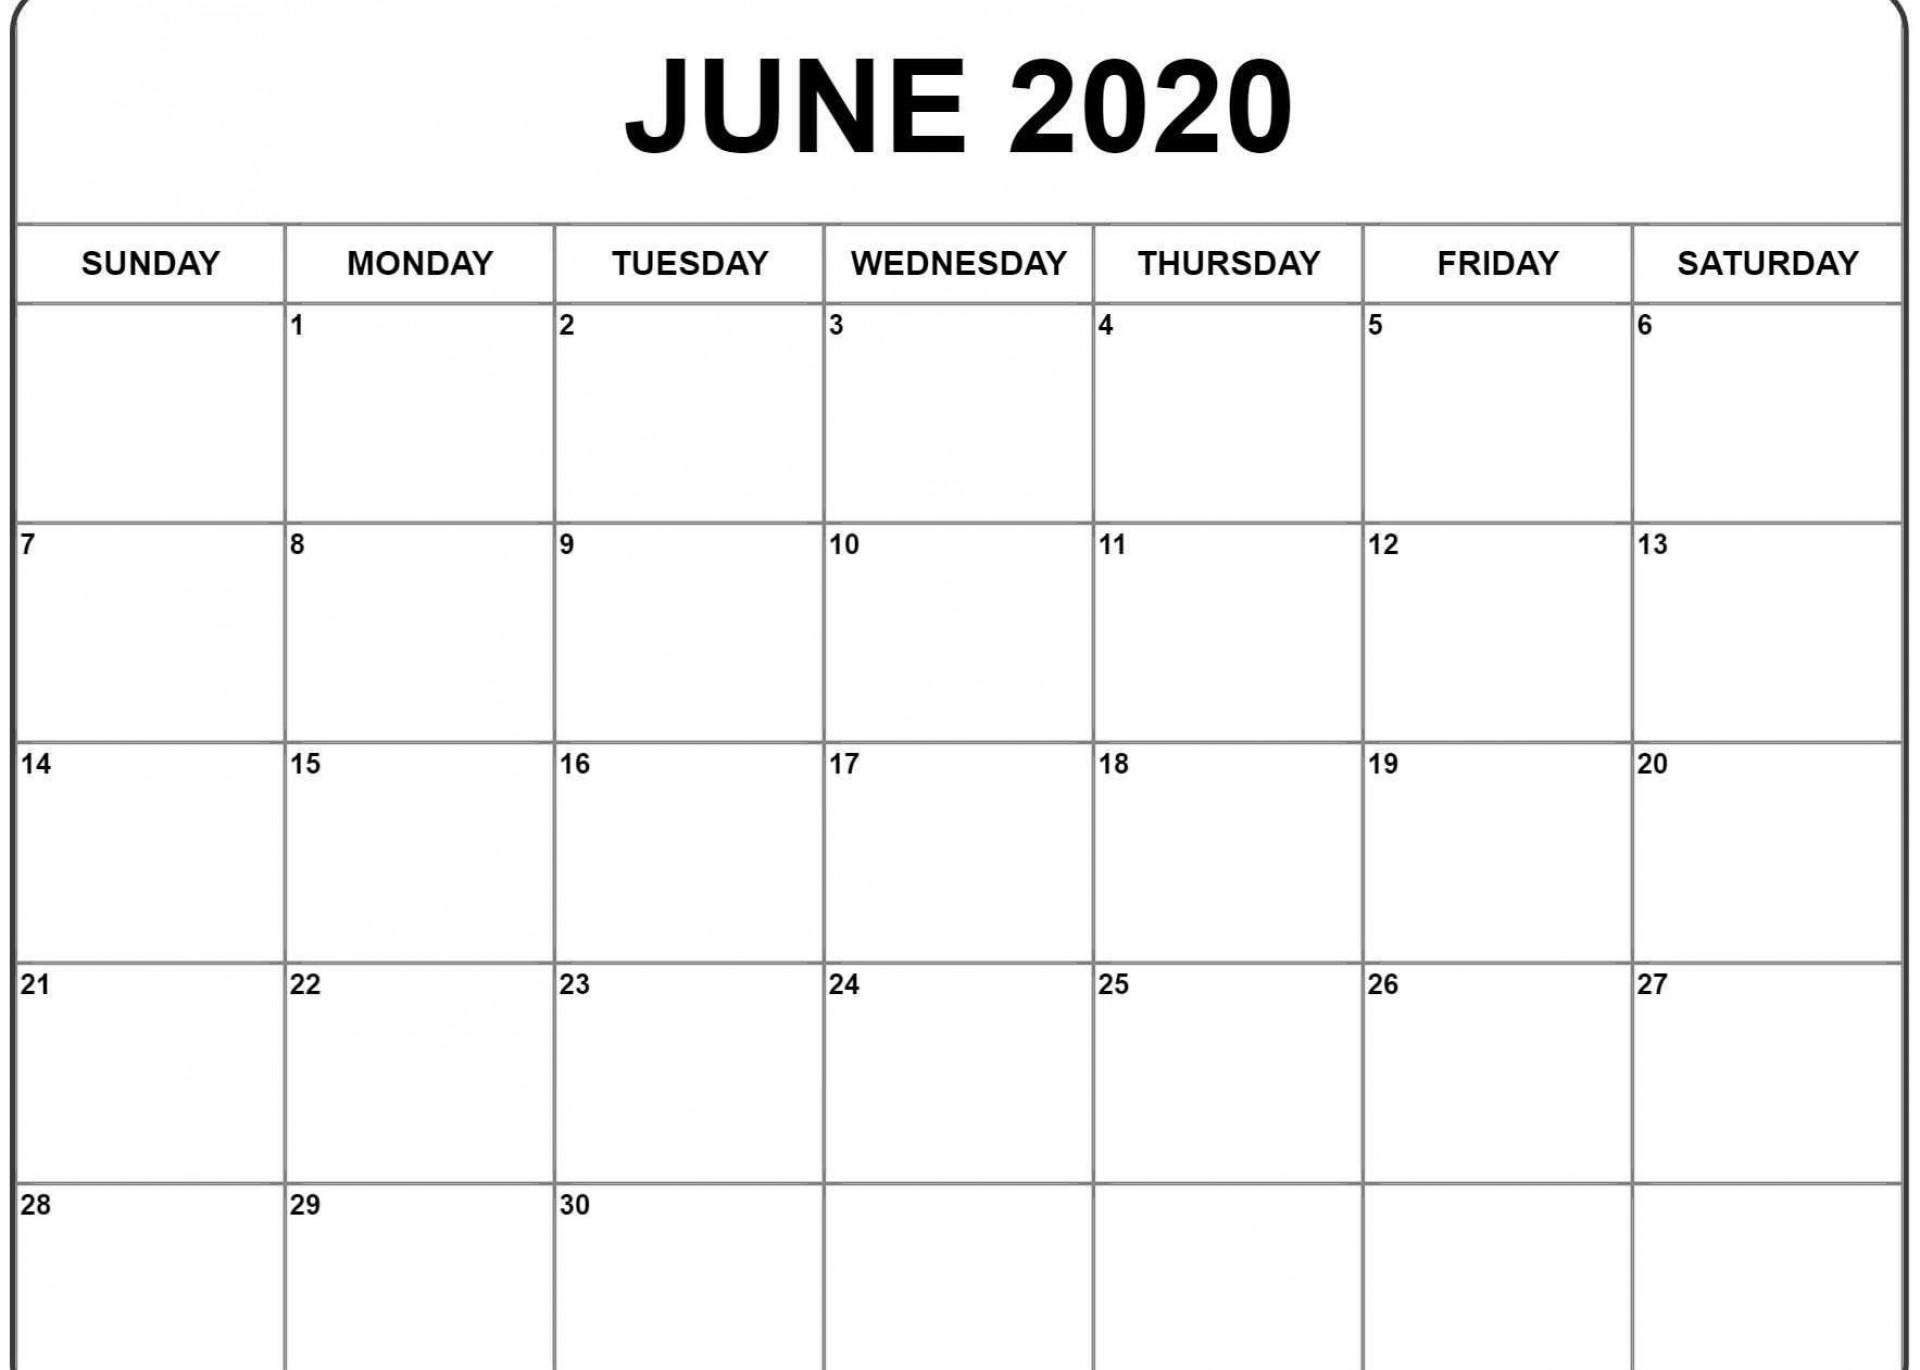 001 Impressive Printable Calendar Template June 2020 Photo  Free1920